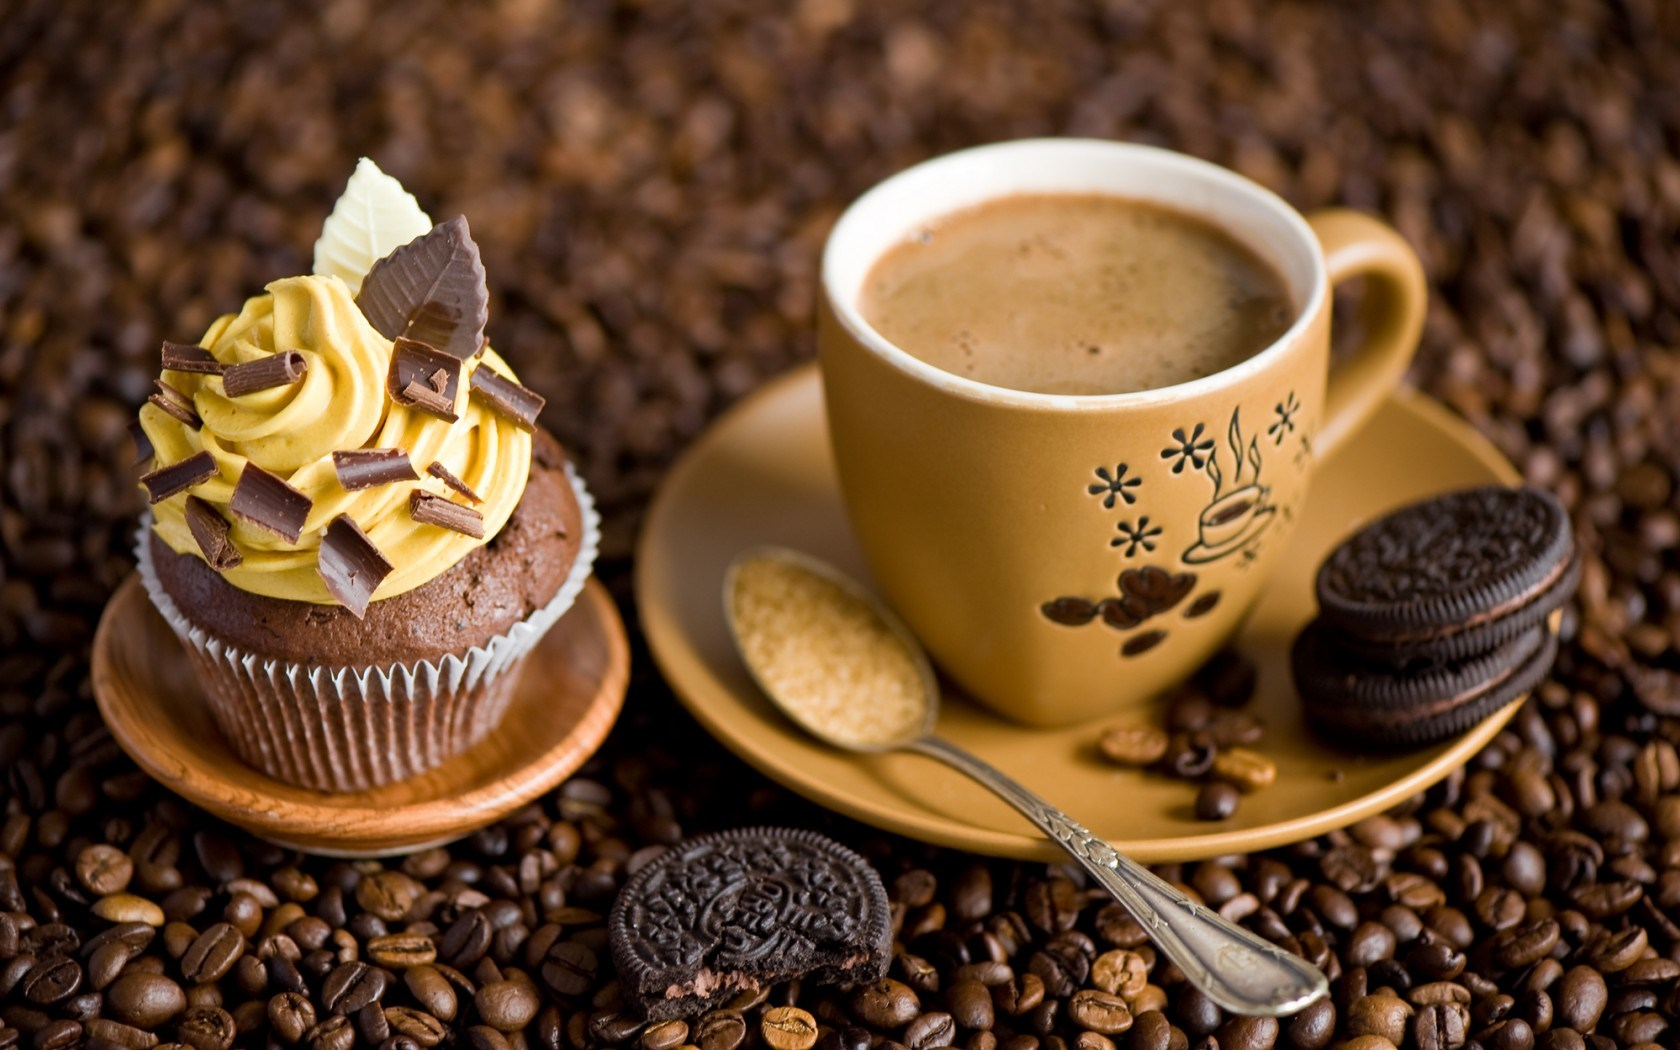 Cupcake Cream Chocolate Cookies Dessert Sweets Coffee Cup